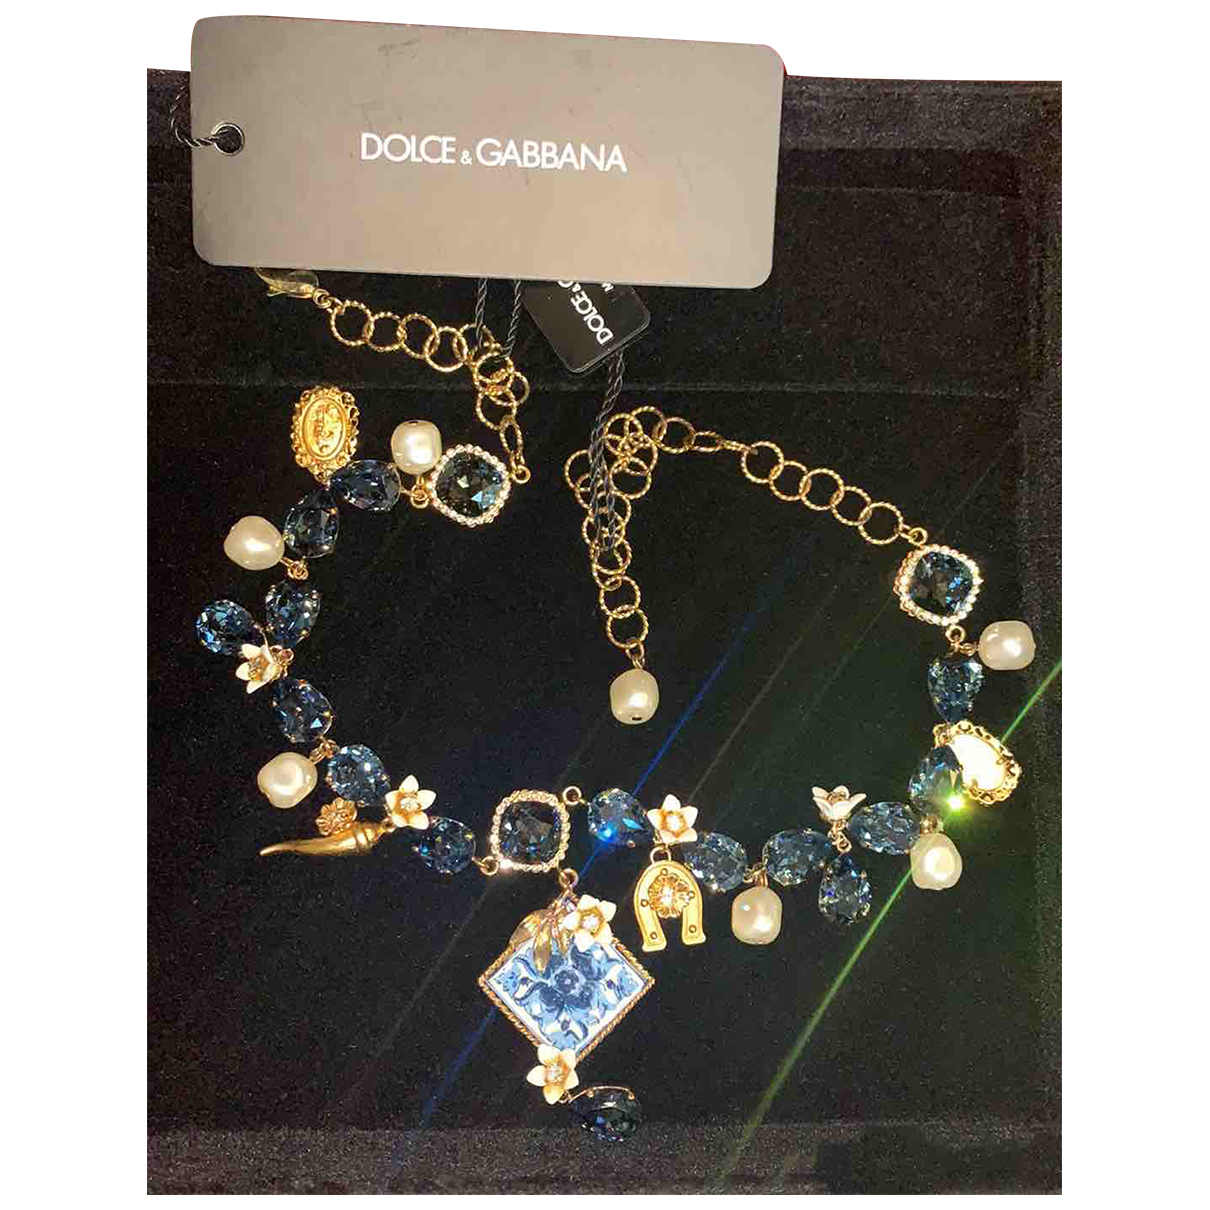 Dolce & Gabbana - Collier   pour femme en metal - bleu